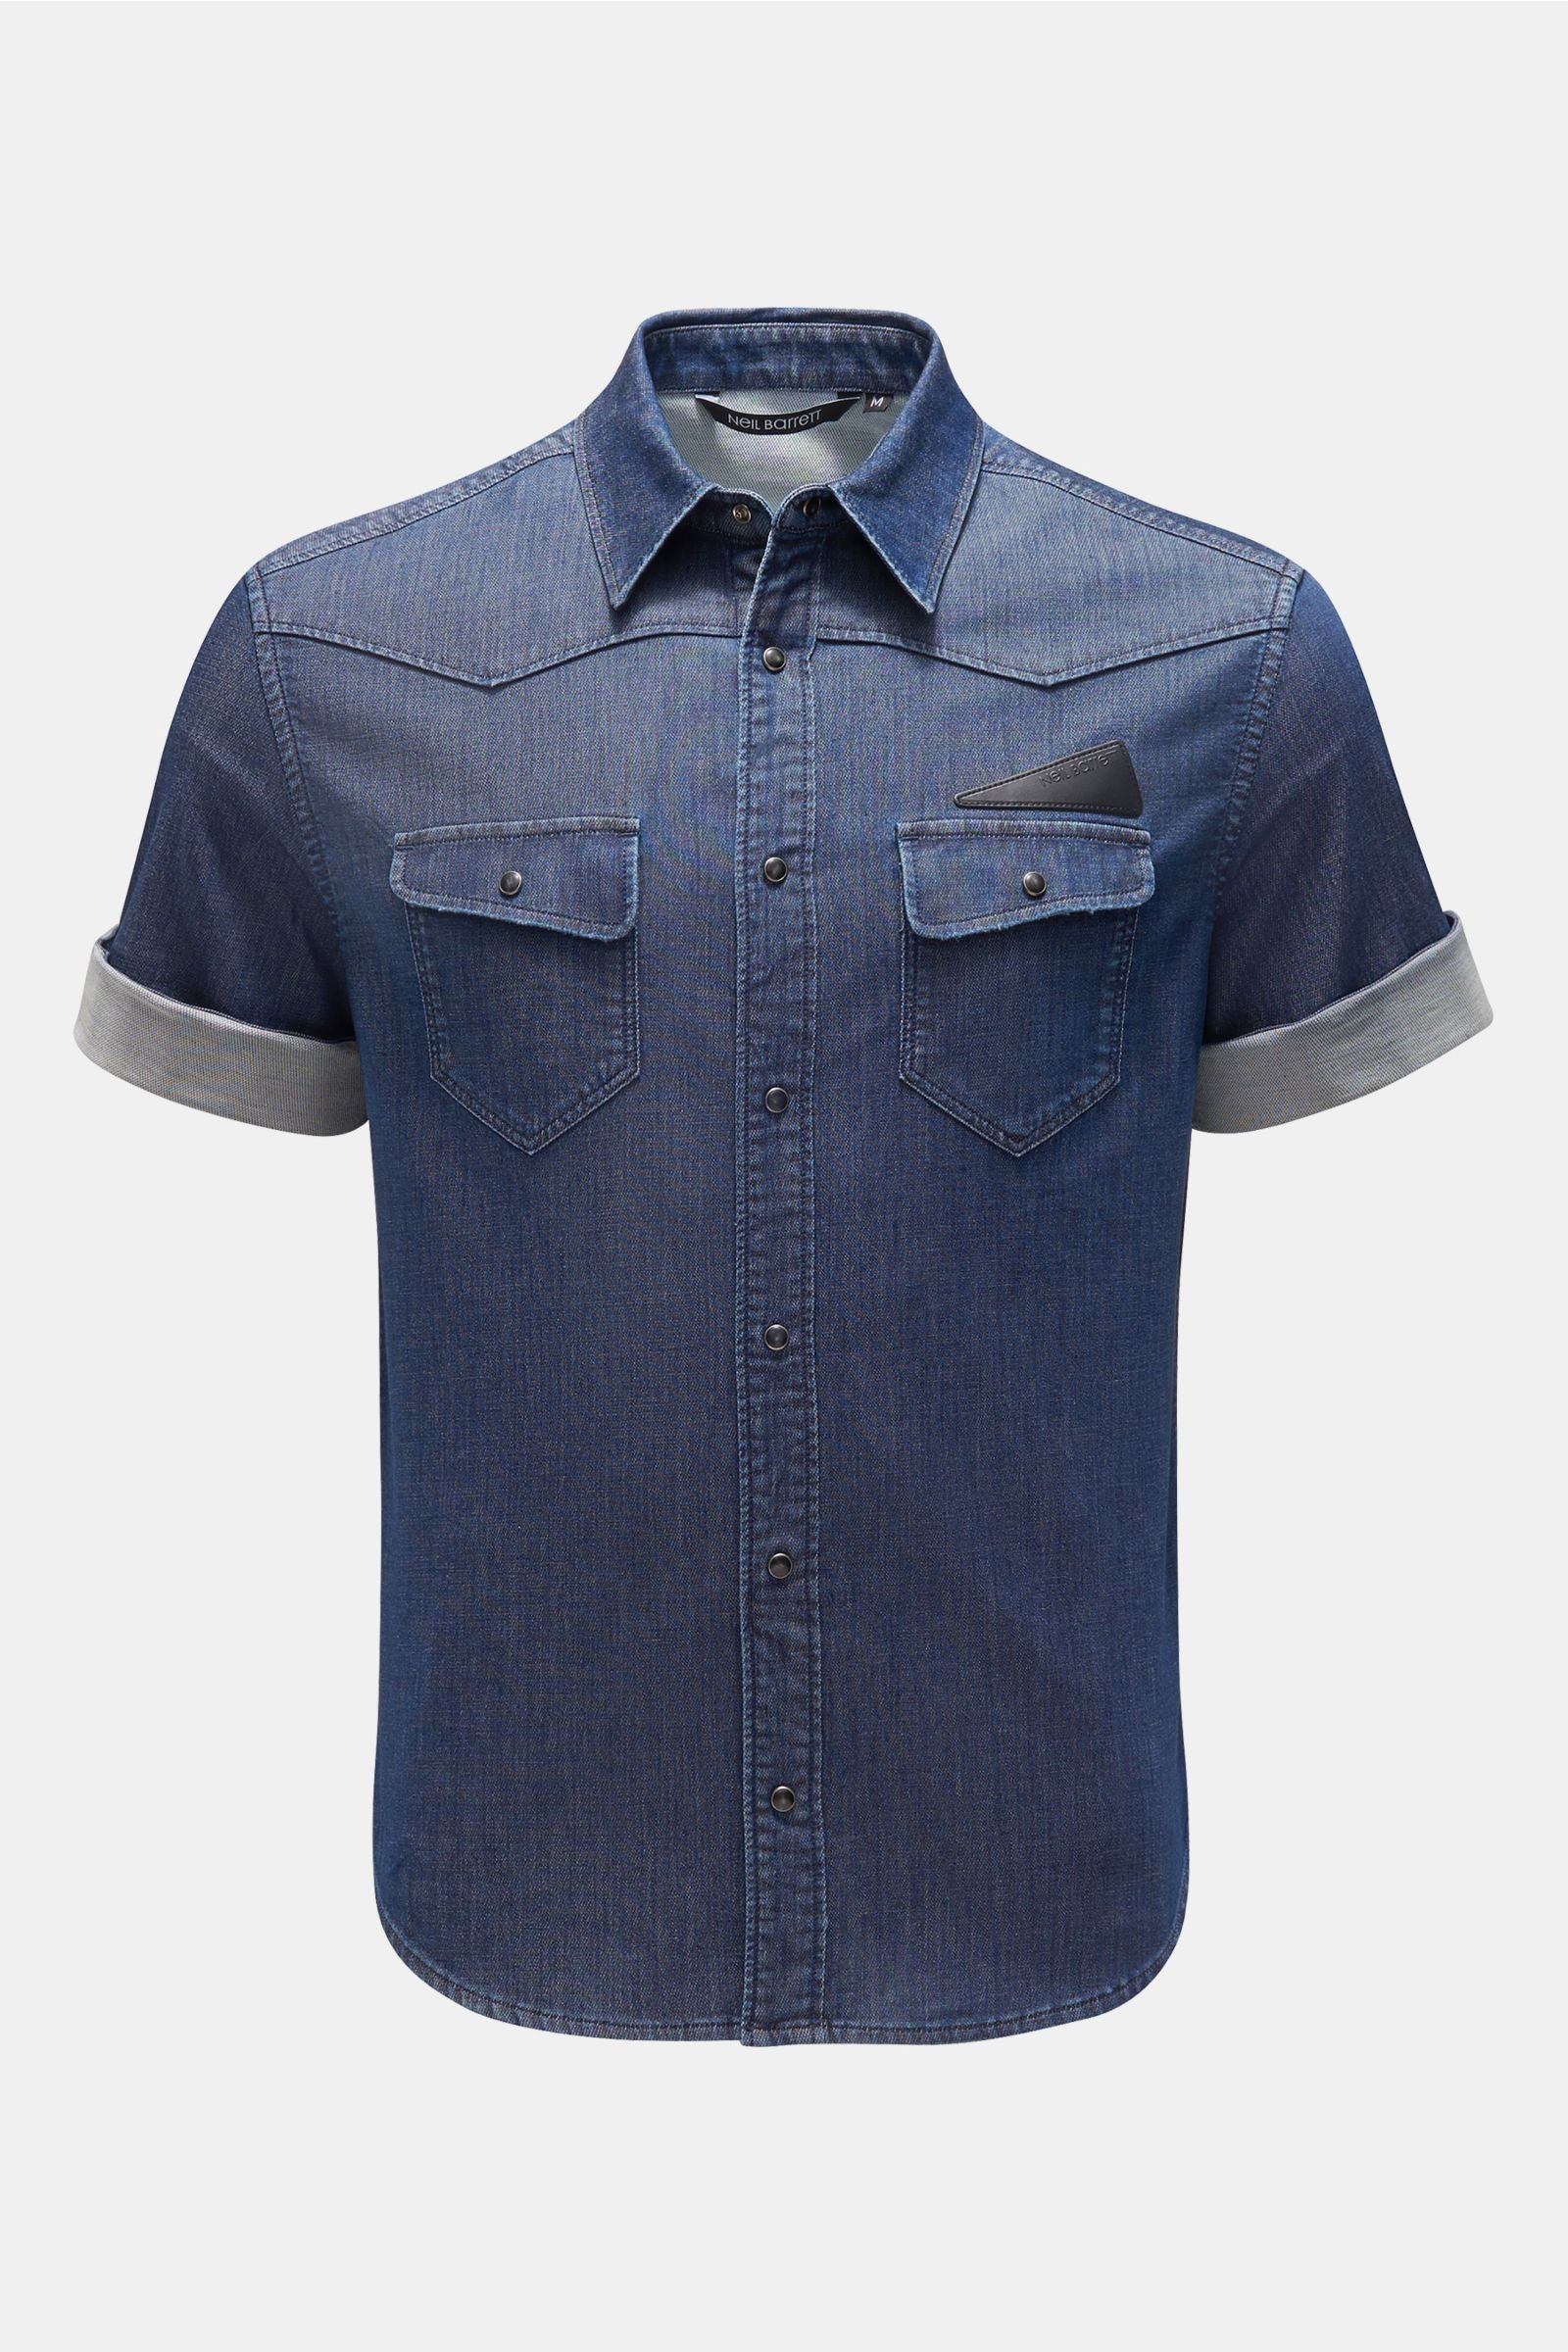 Jeans-Kurzarmhemd Kent-Kragen dunkelblau